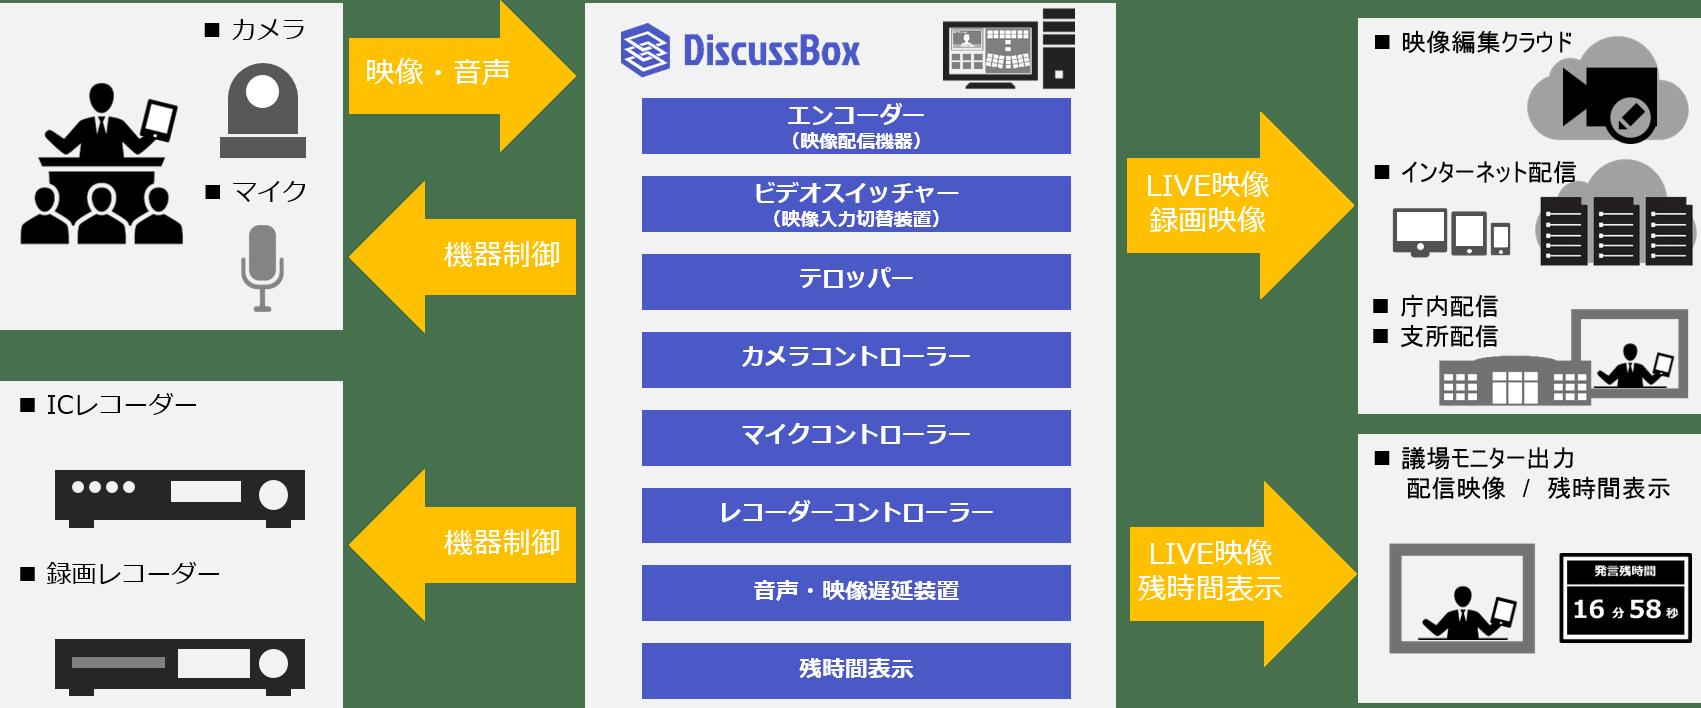 DiscussBoxサービスイメージ